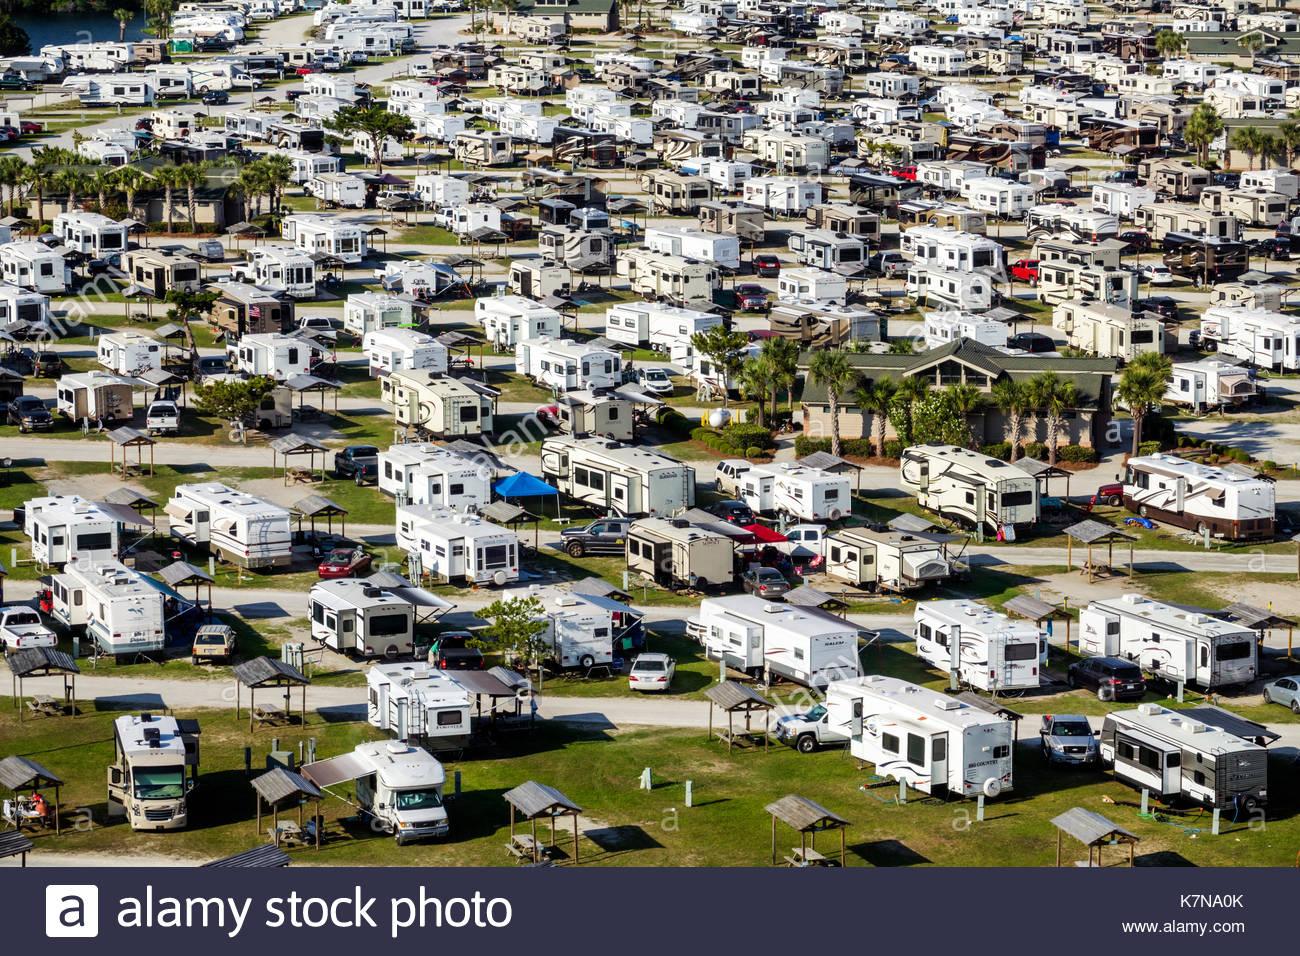 Myrtle Beach South Carolina SC Myrtle Beach RV Travel Park recreational vehicles trailer caravan park campground - Stock Image